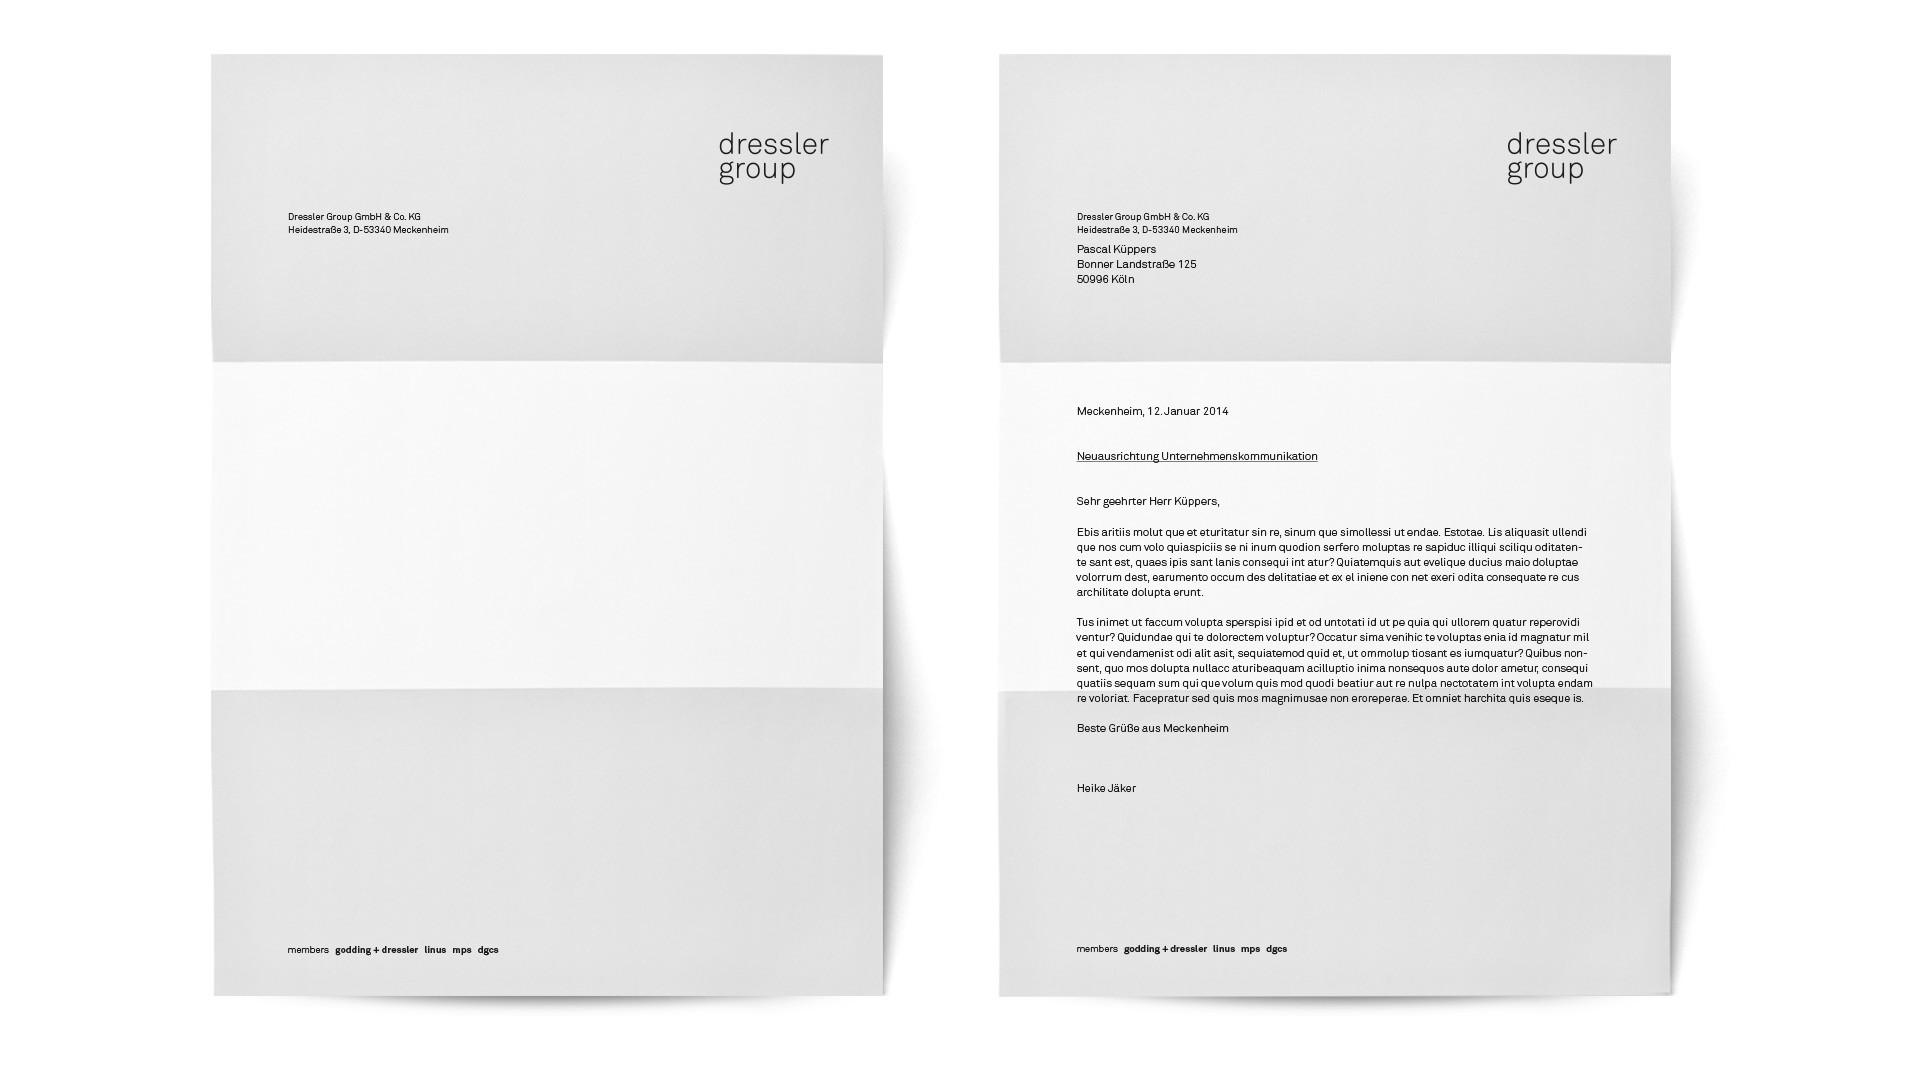 BUREAU KUEPPERS Corporate Identity Entwicklung für Dressler Group